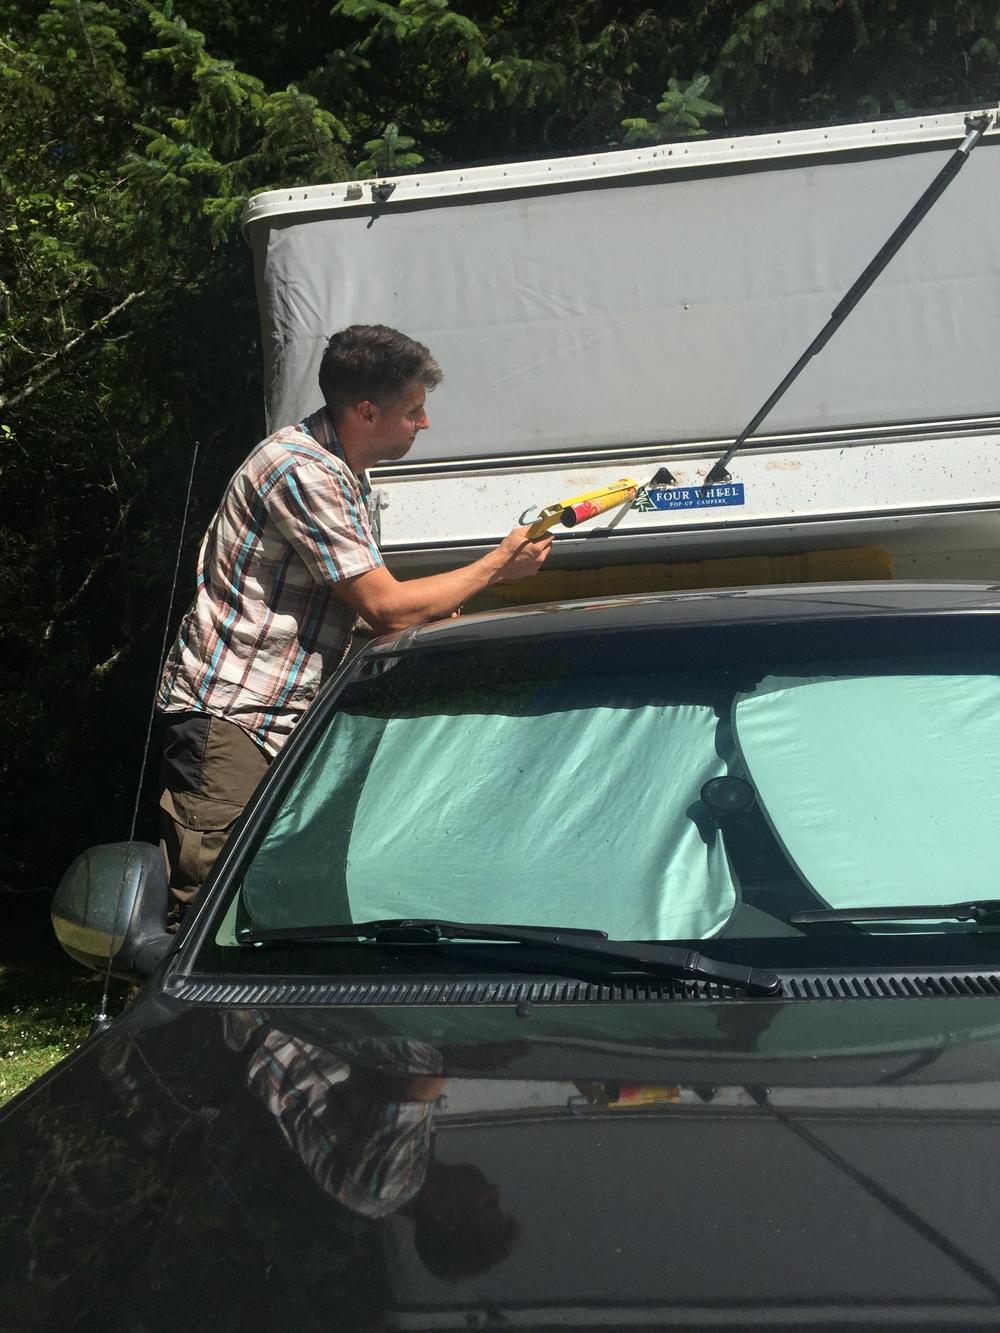 Strut repairs... the camper doesn't like pressure.